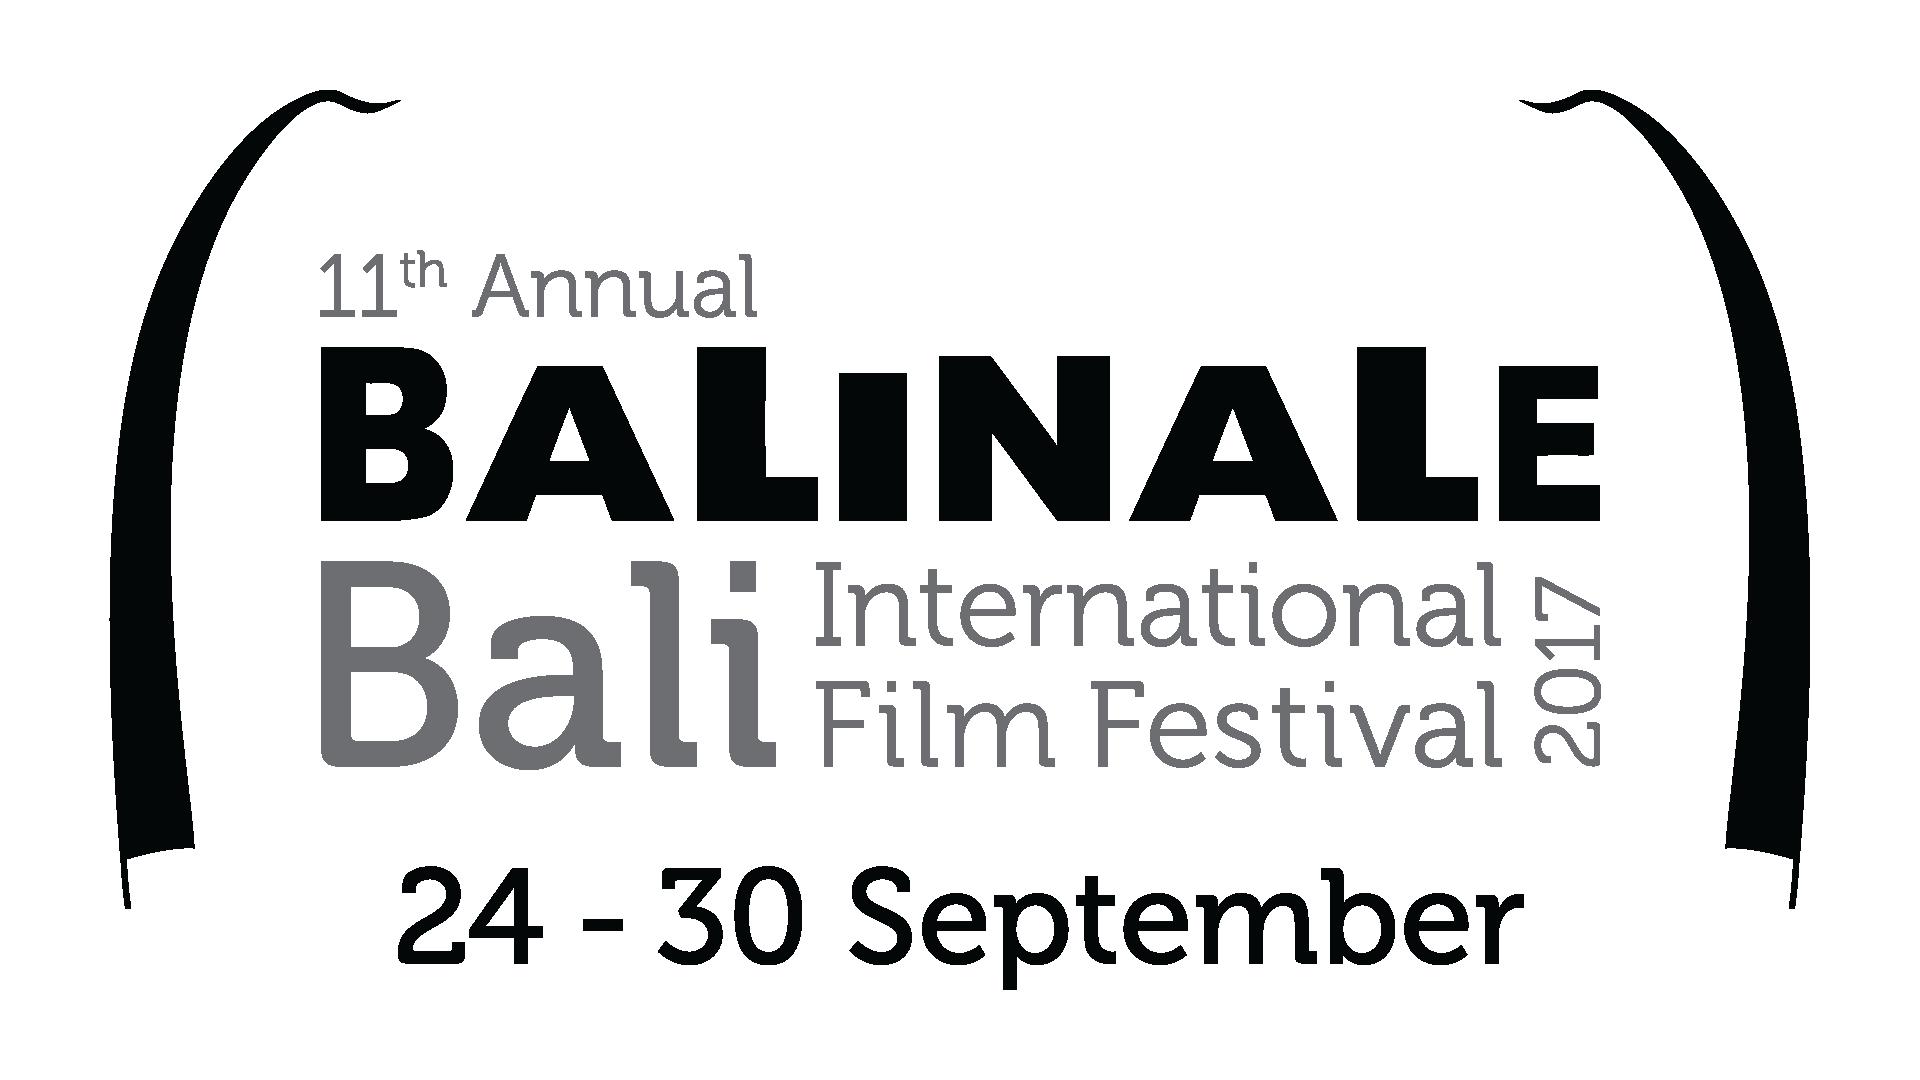 Thumbnail-Balinale-logo-17-date-01.png